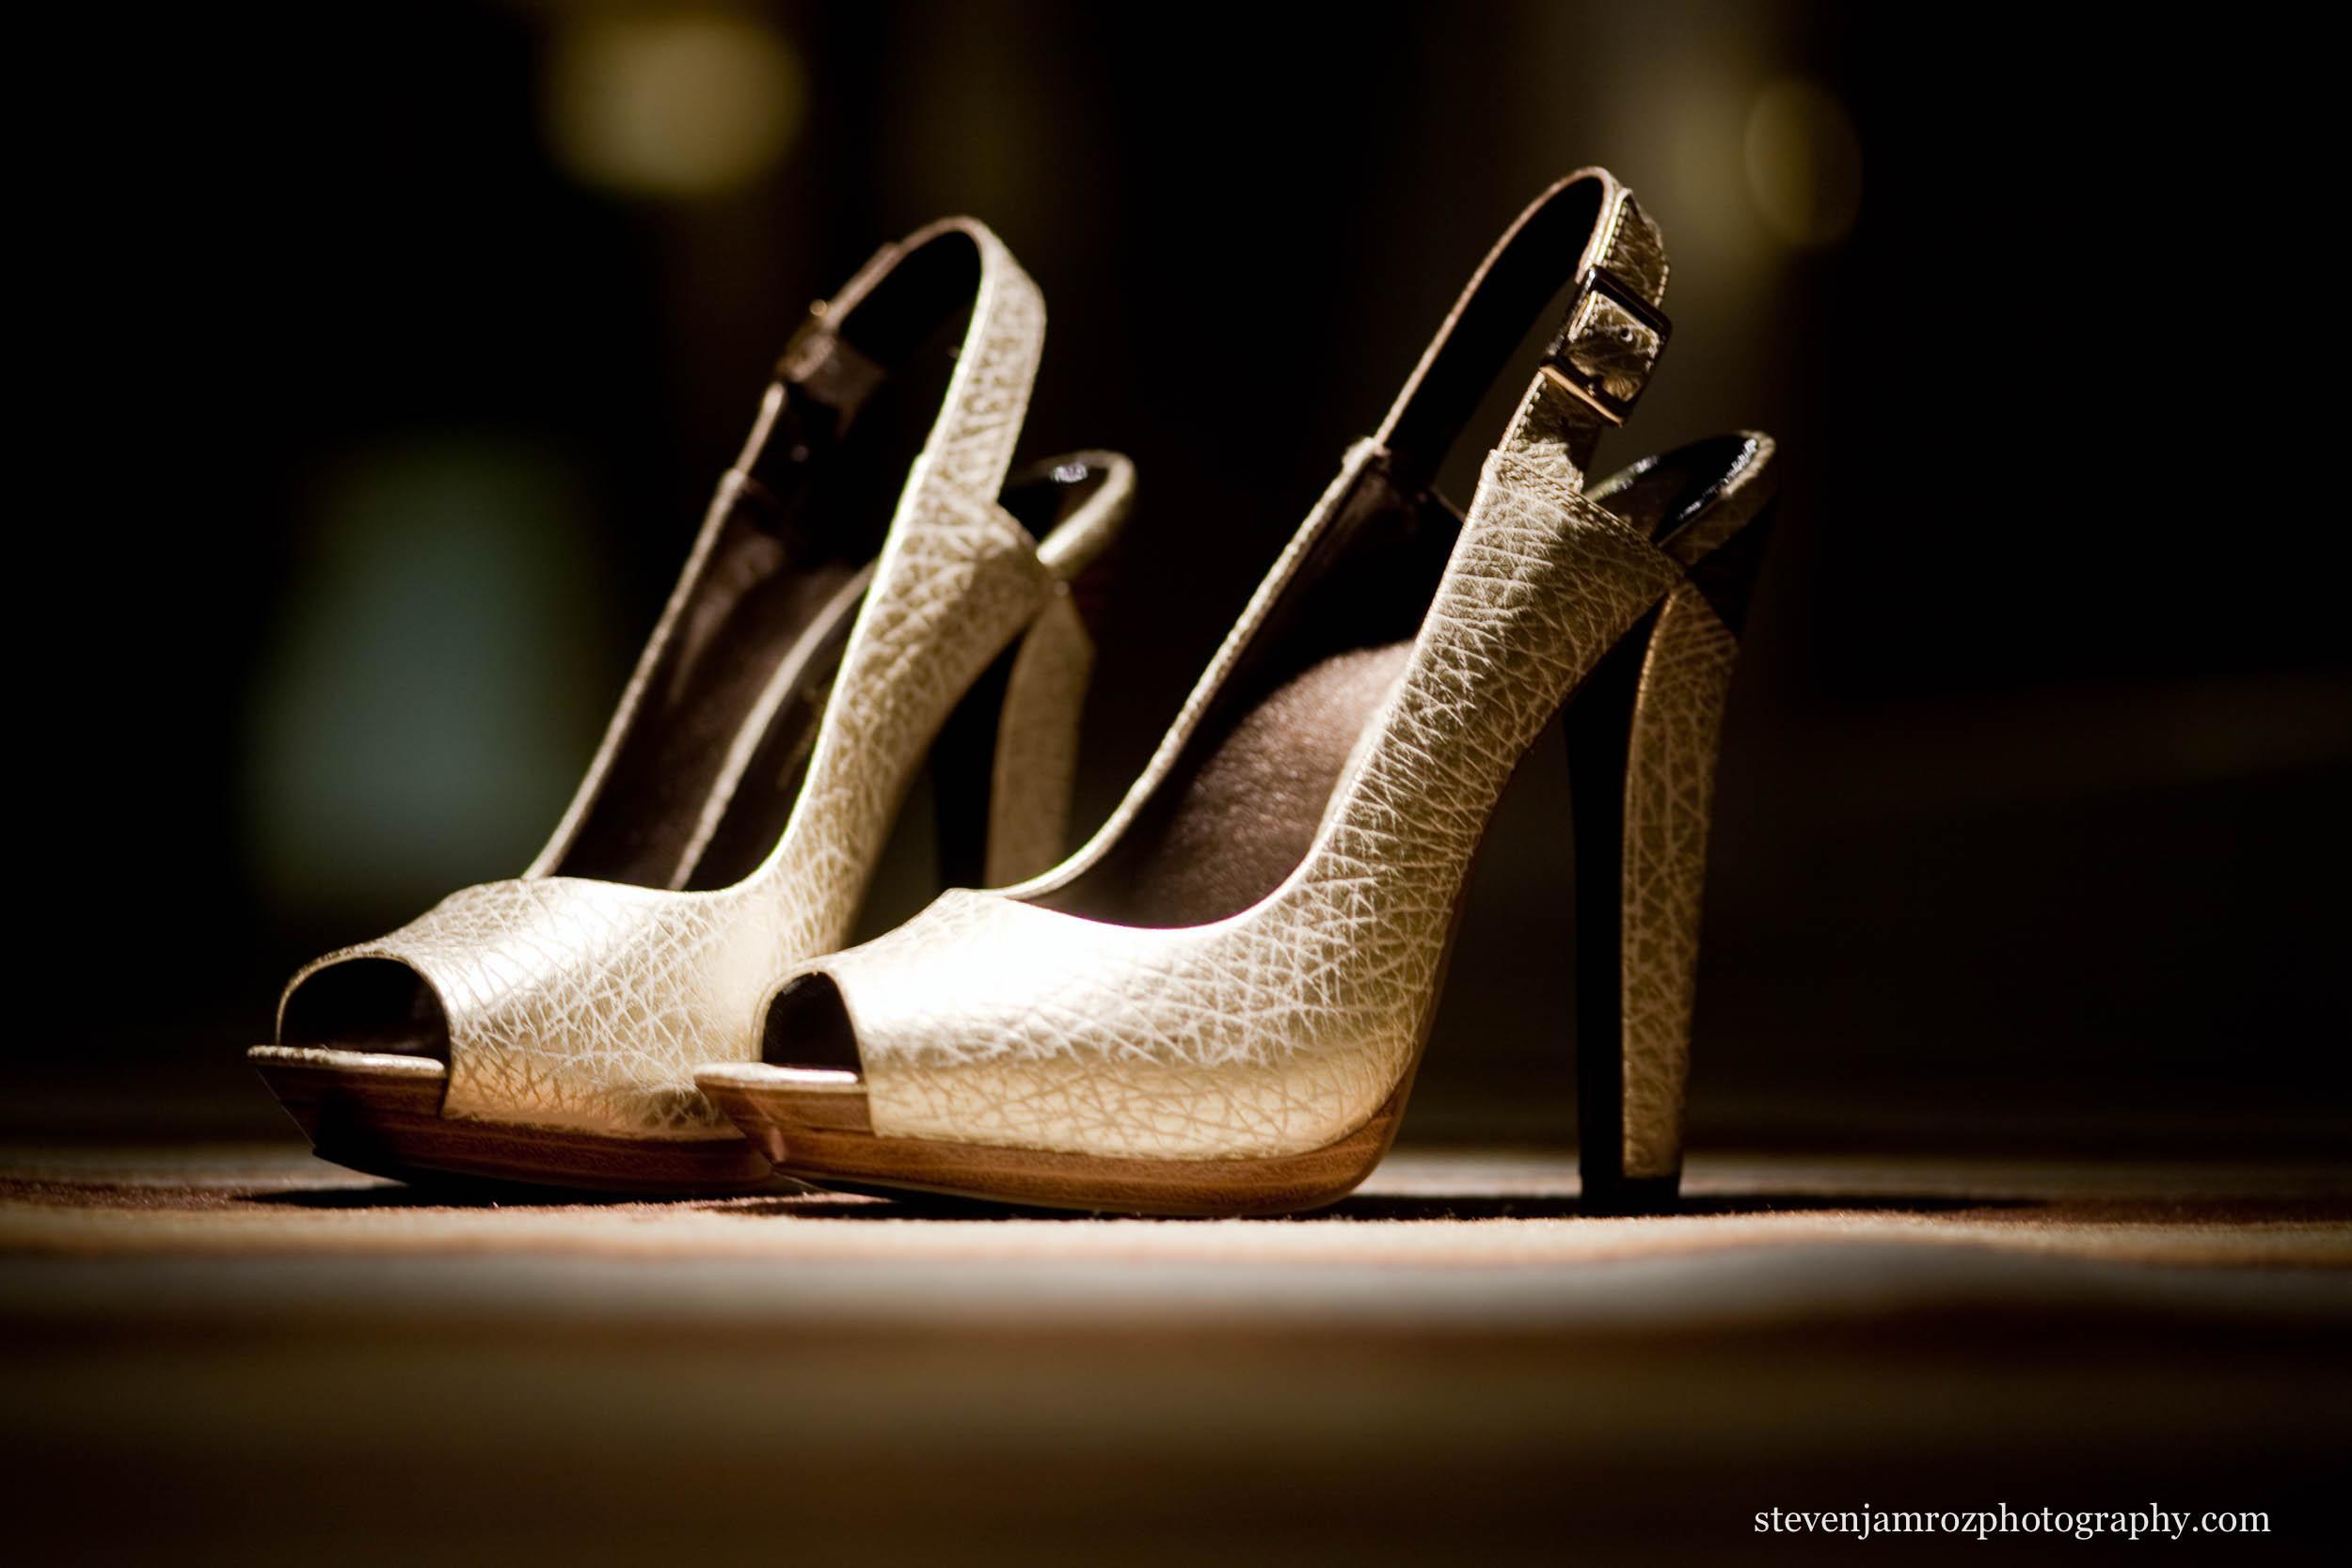 high-heel-shoes-wedding-photography-steven-jamroz-photography-0229.jpg